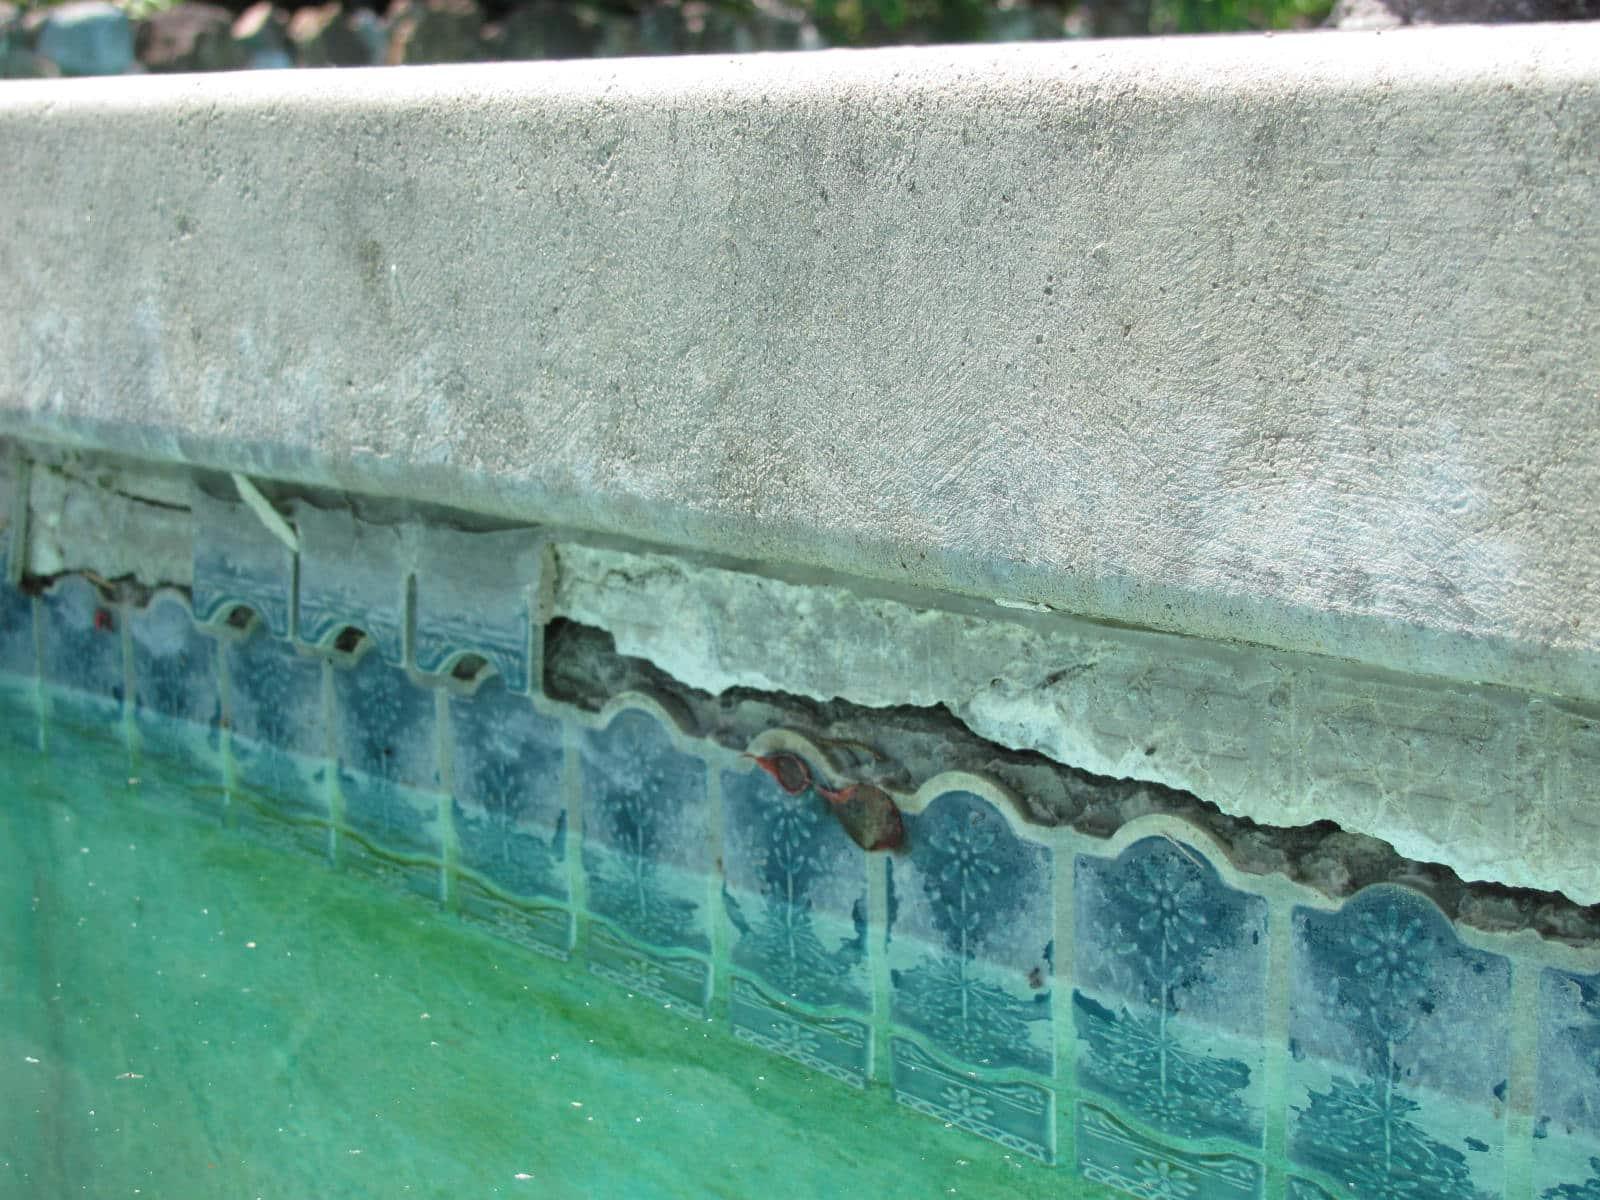 Pool and tile cracks and damage